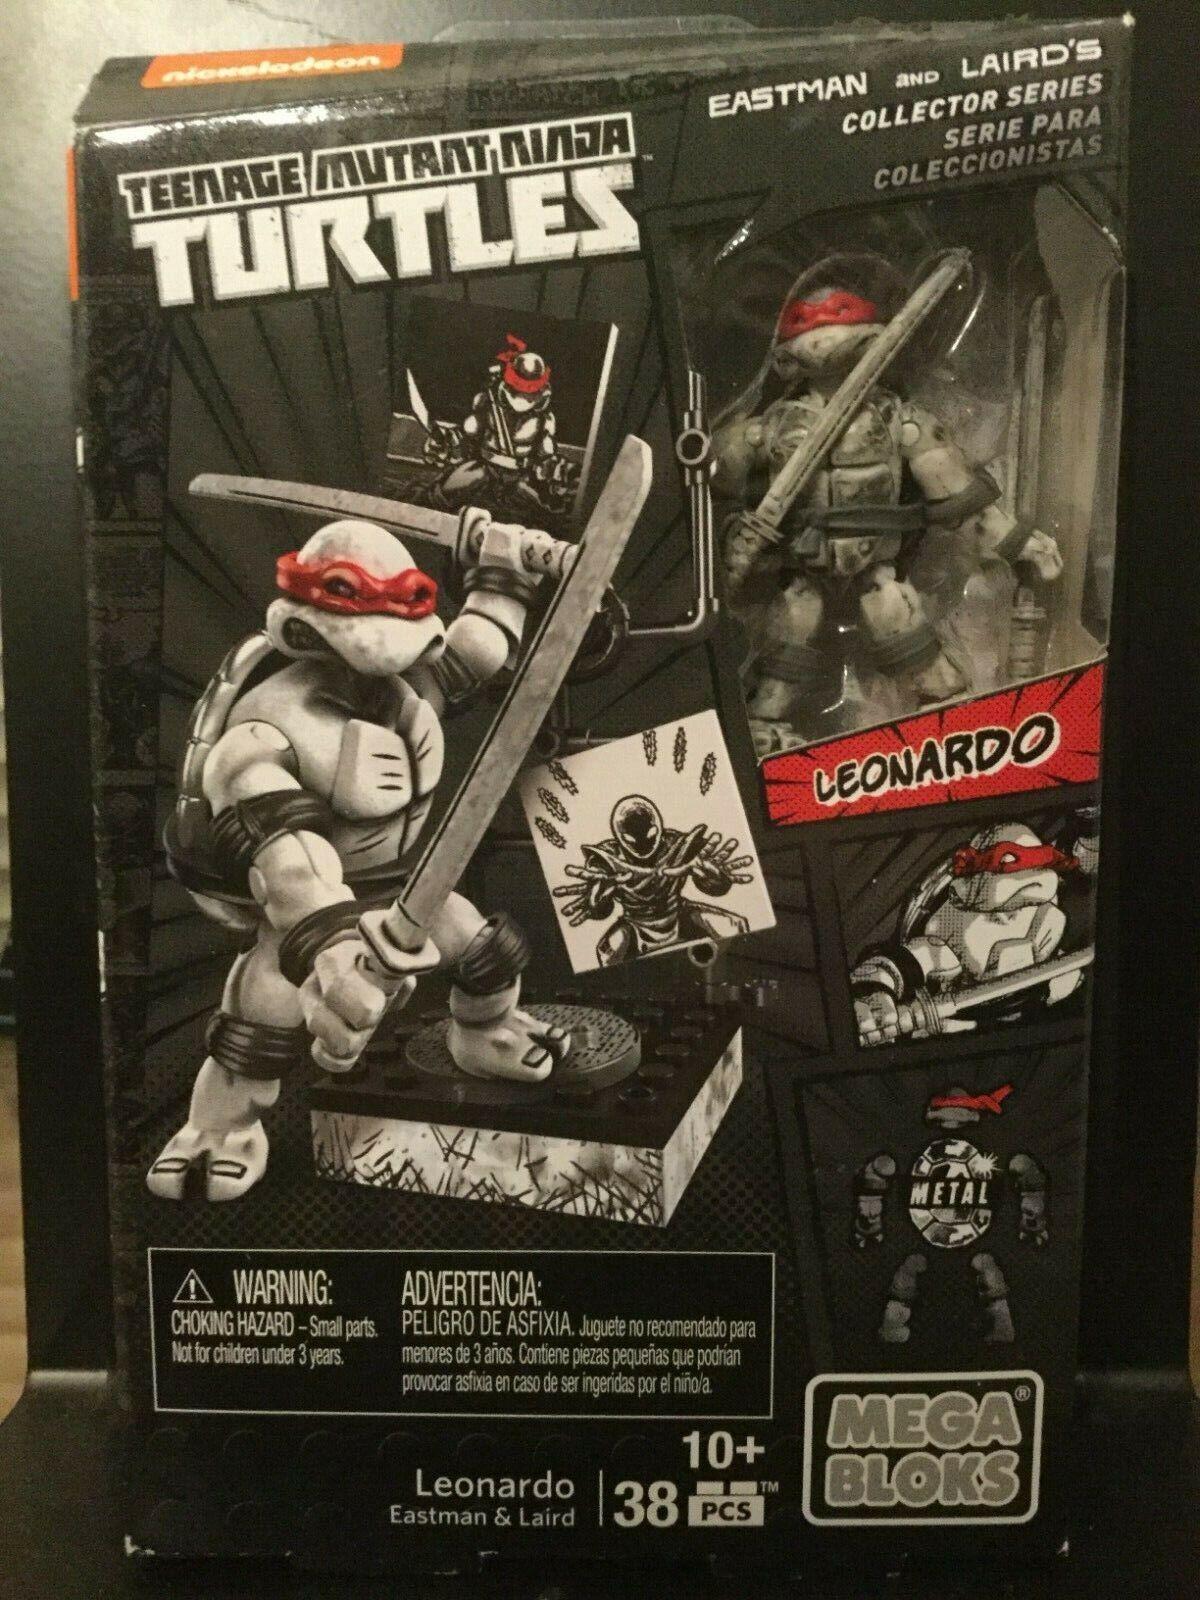 Mega Bloks Ninja Turtles Eastman /& Laird /'s Collector Series Rooftop Combat